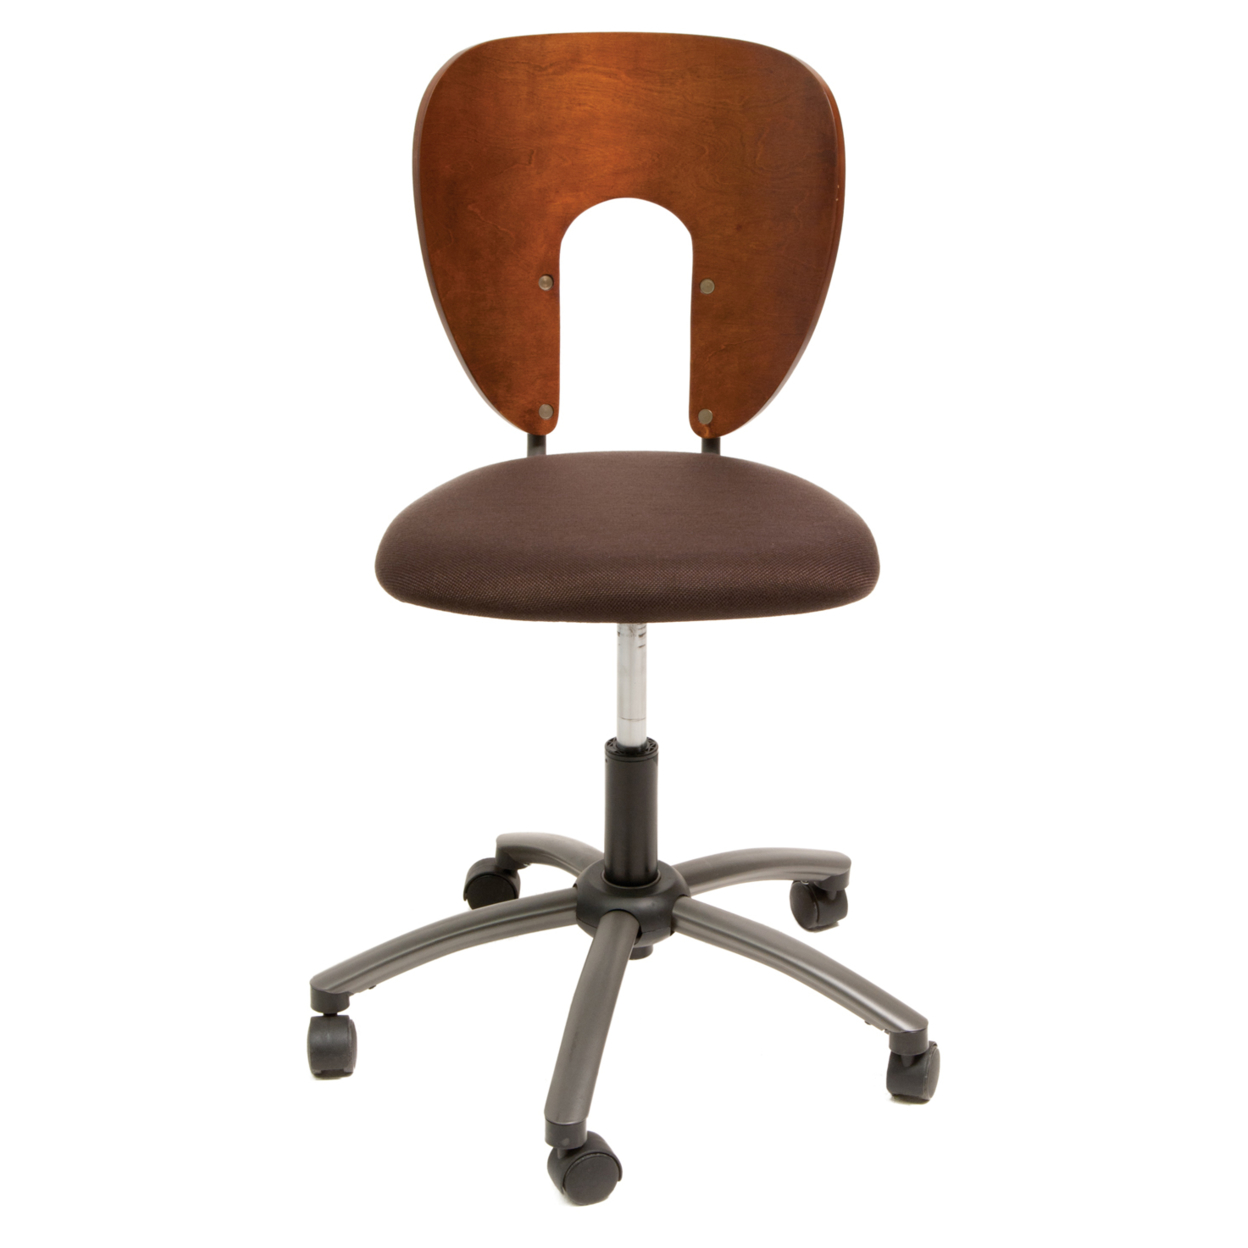 Studio Designs Home Office Ponderosa Chair Sonoma - Brown studio designs home office maxima ii drafting chair black